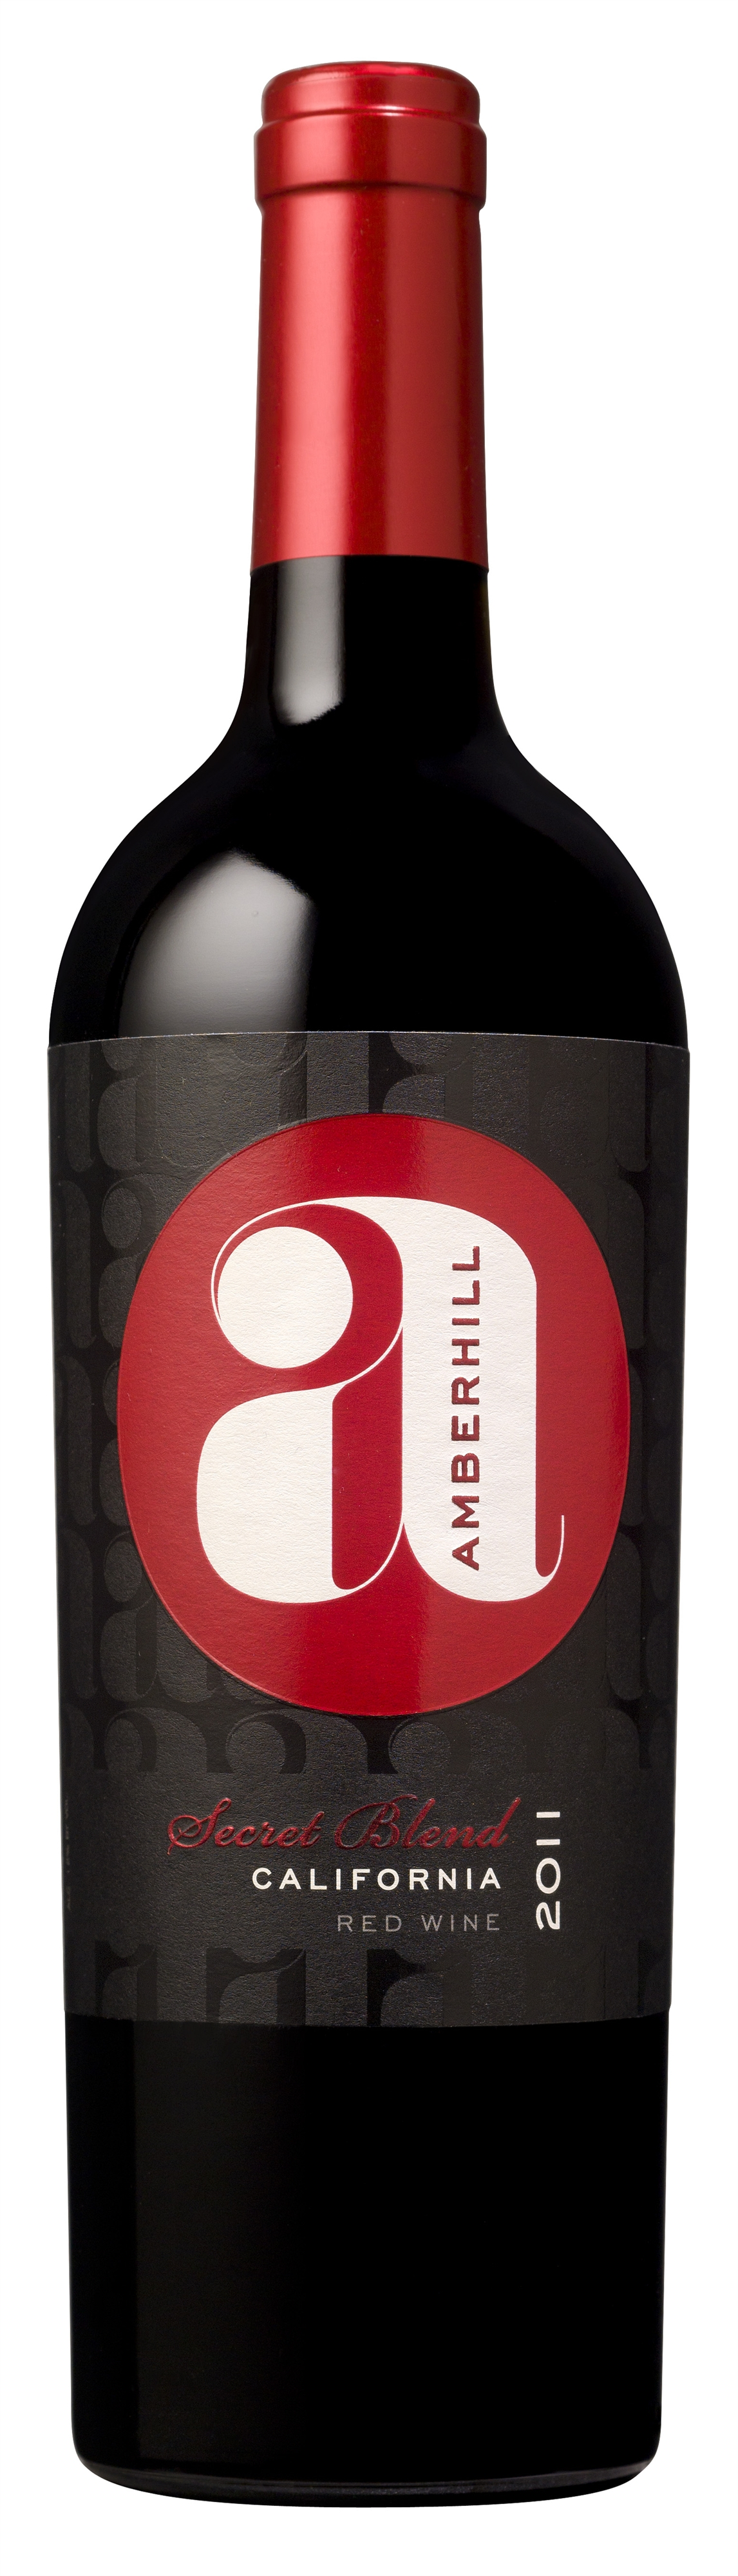 Pin By Amberhill Wines On Sip Bing Cherries Espresso Beans Wine